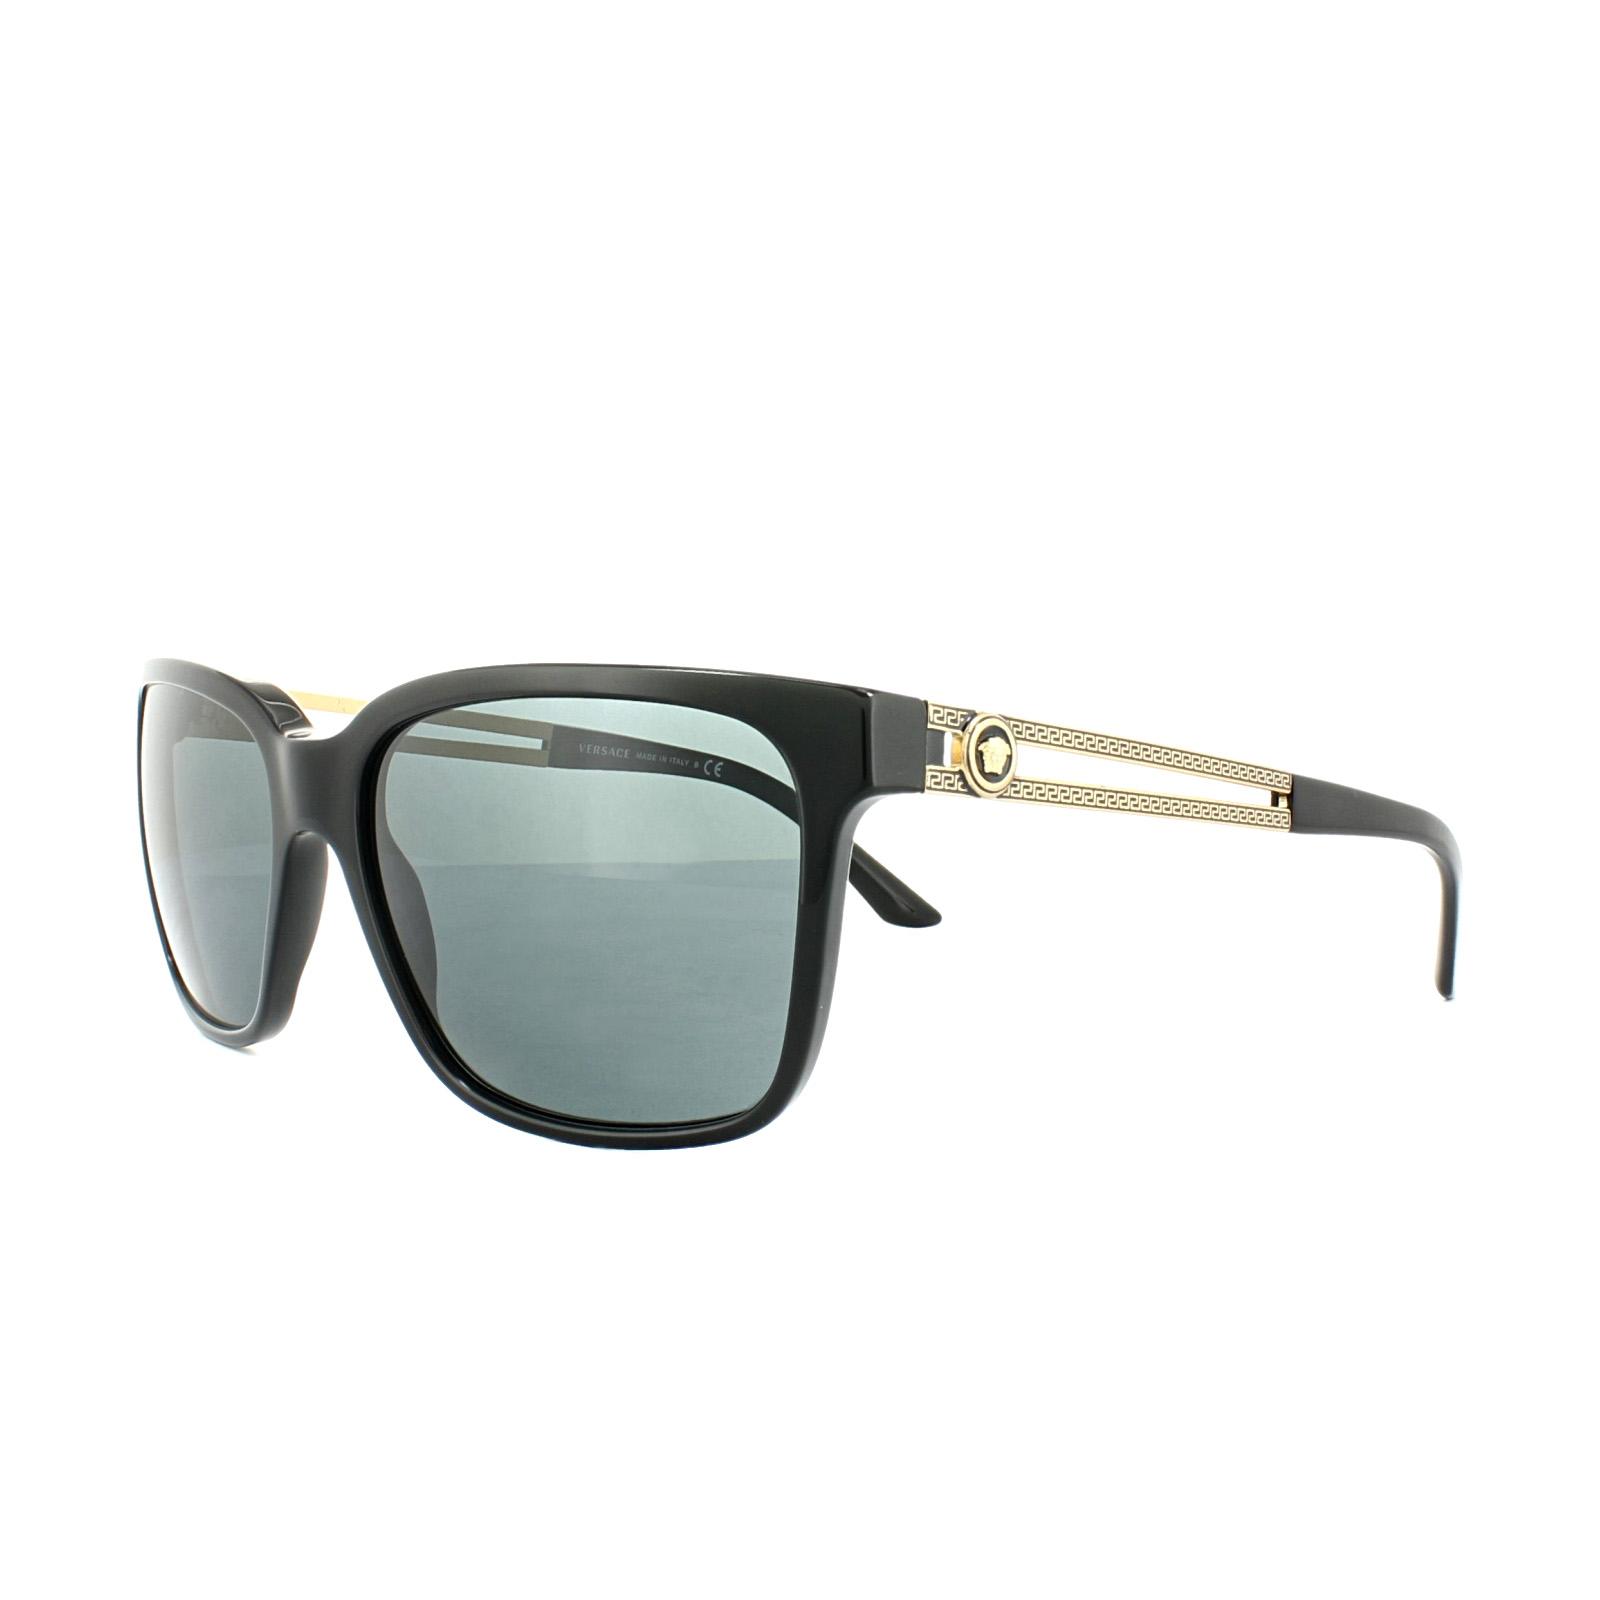 5819ddaa5c7 Details about Versace Sunglasses 4307 GB1 87 Black Grey